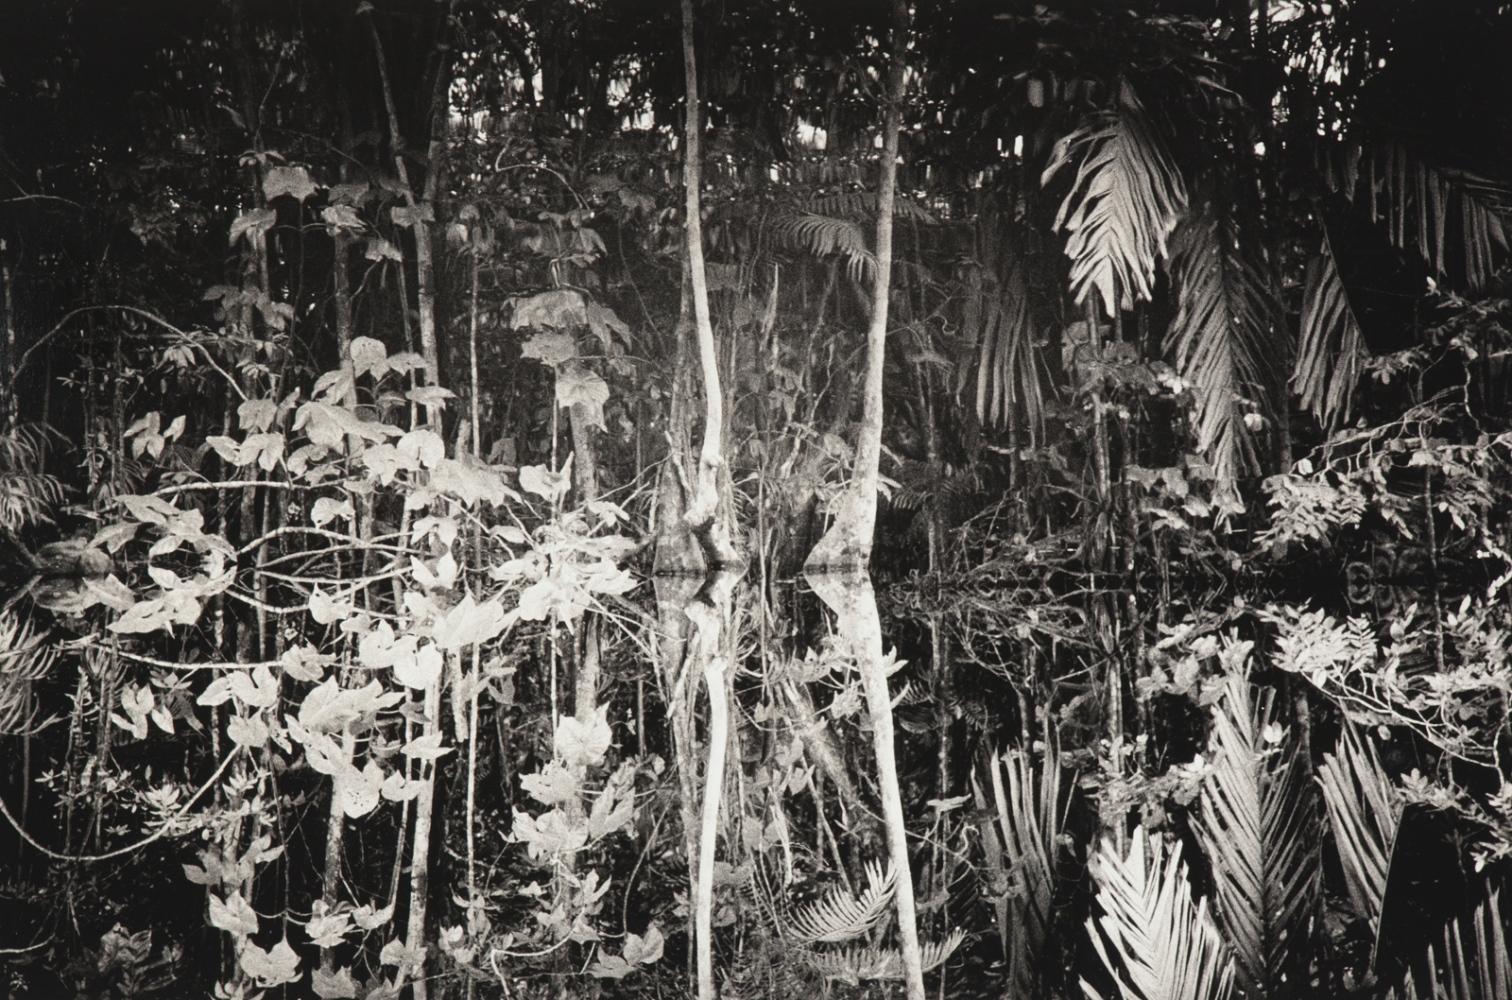 Art and Documentary Photography - Loading WEB_Waniku_AndreaSantolaya-8.jpg